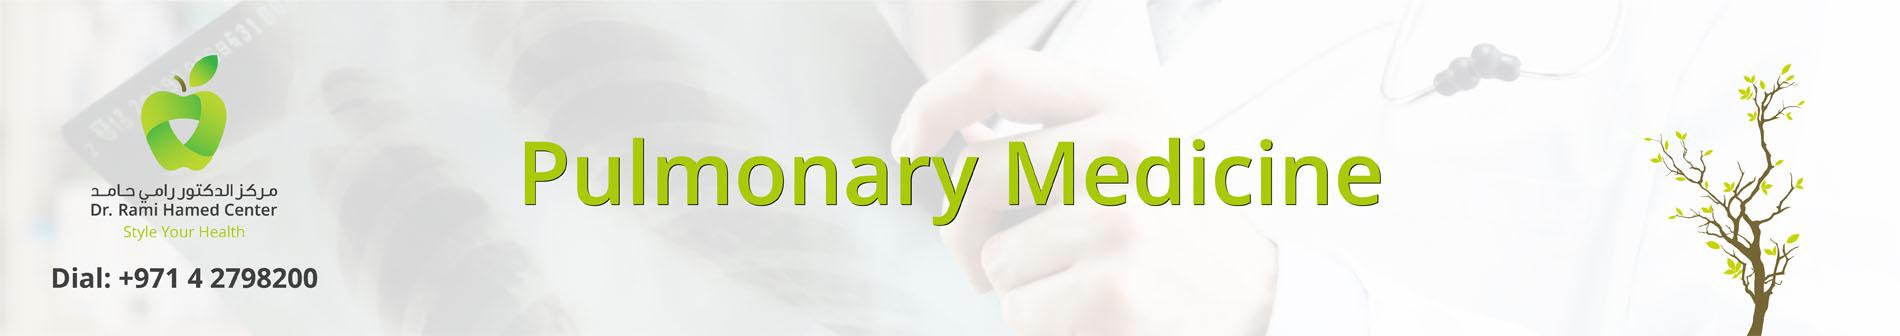 Dubai Pulmonary Medicine Clinic